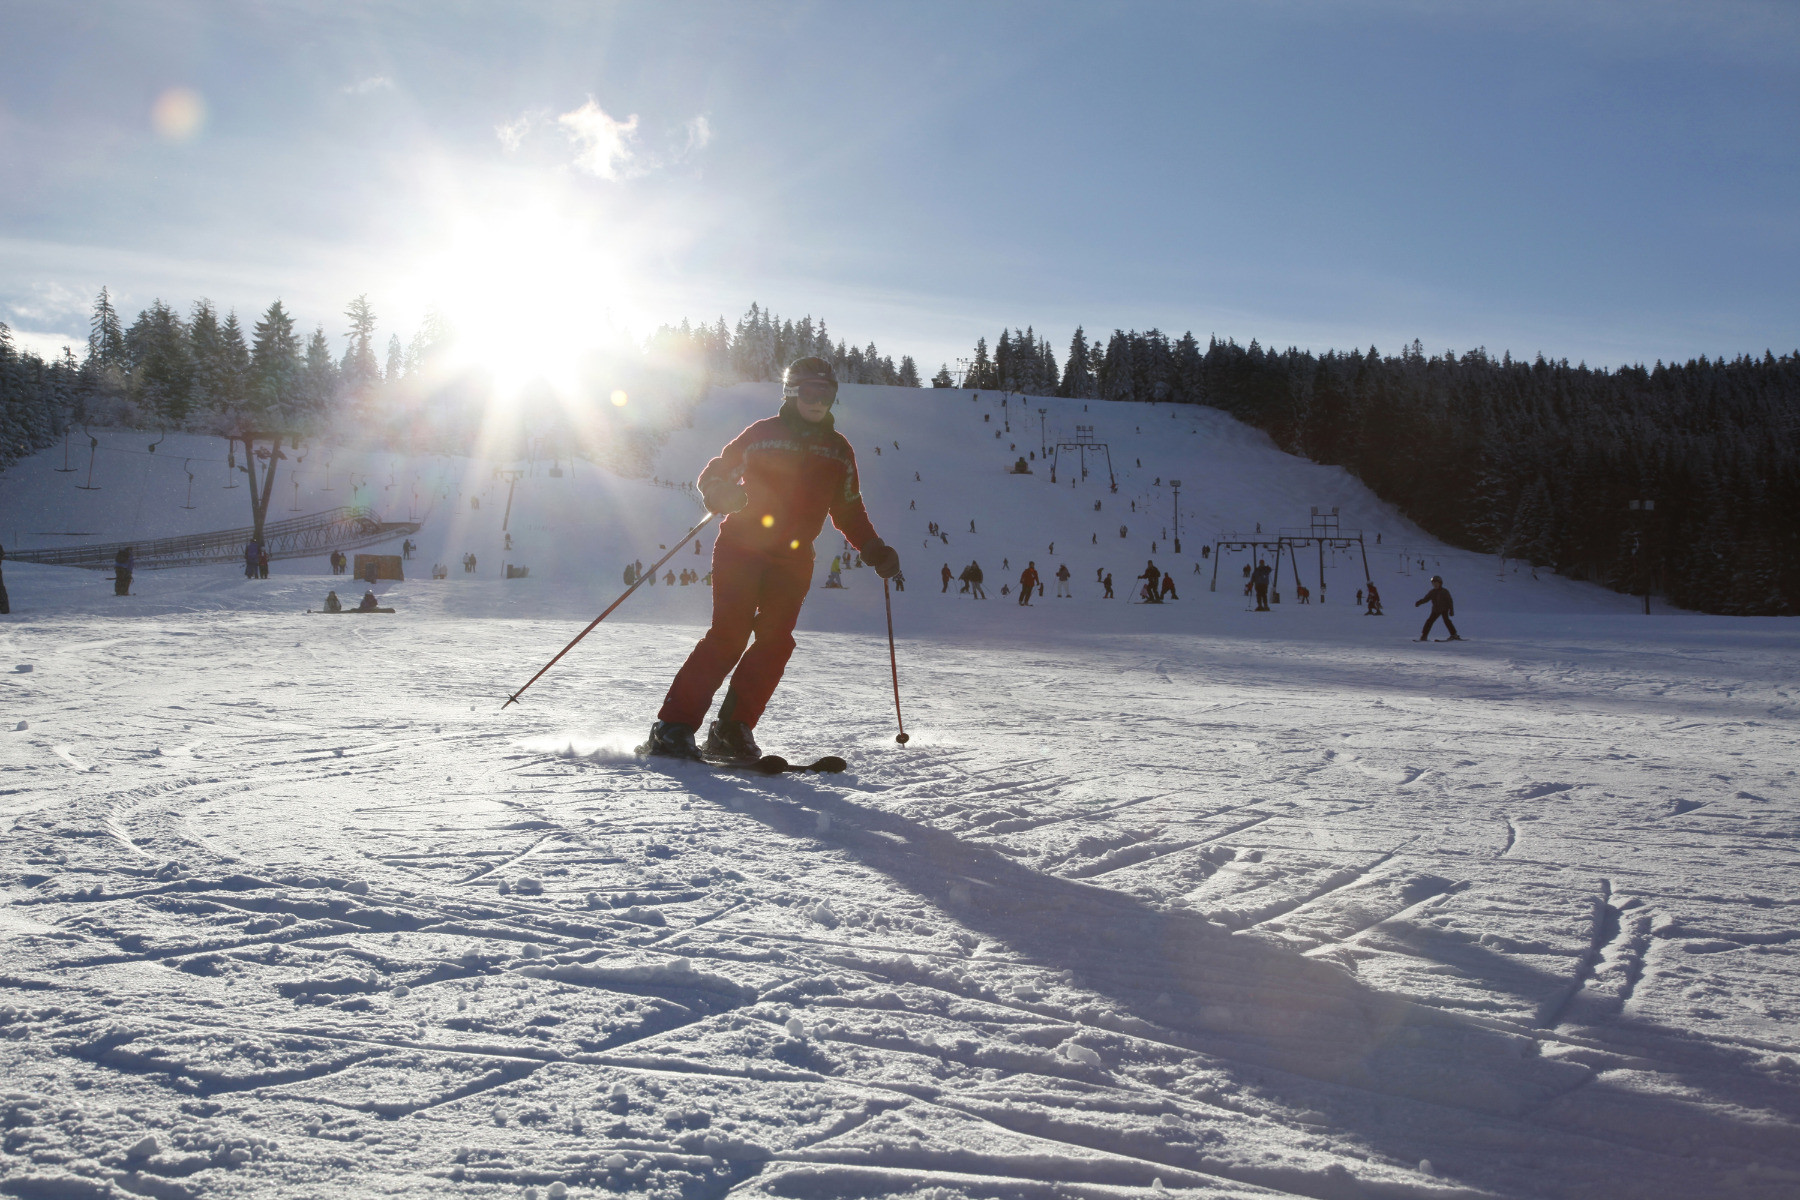 Wintersportgebiet Murgtal / Bühlertalundefined